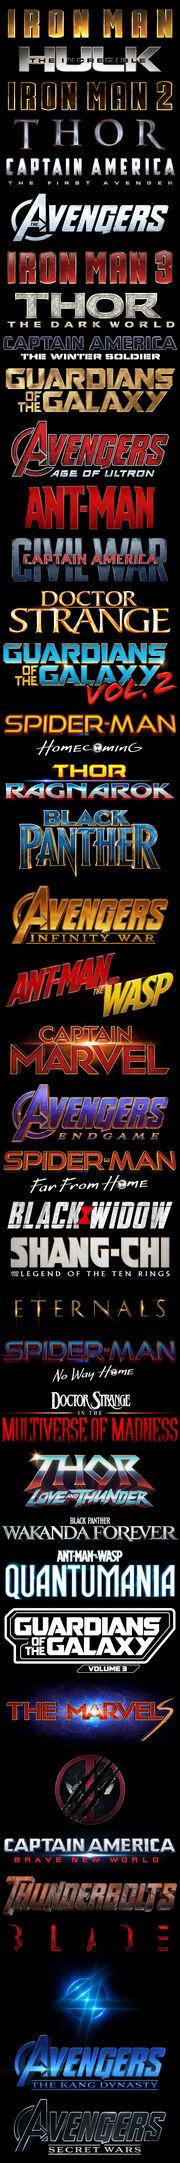 MCU Films Logos